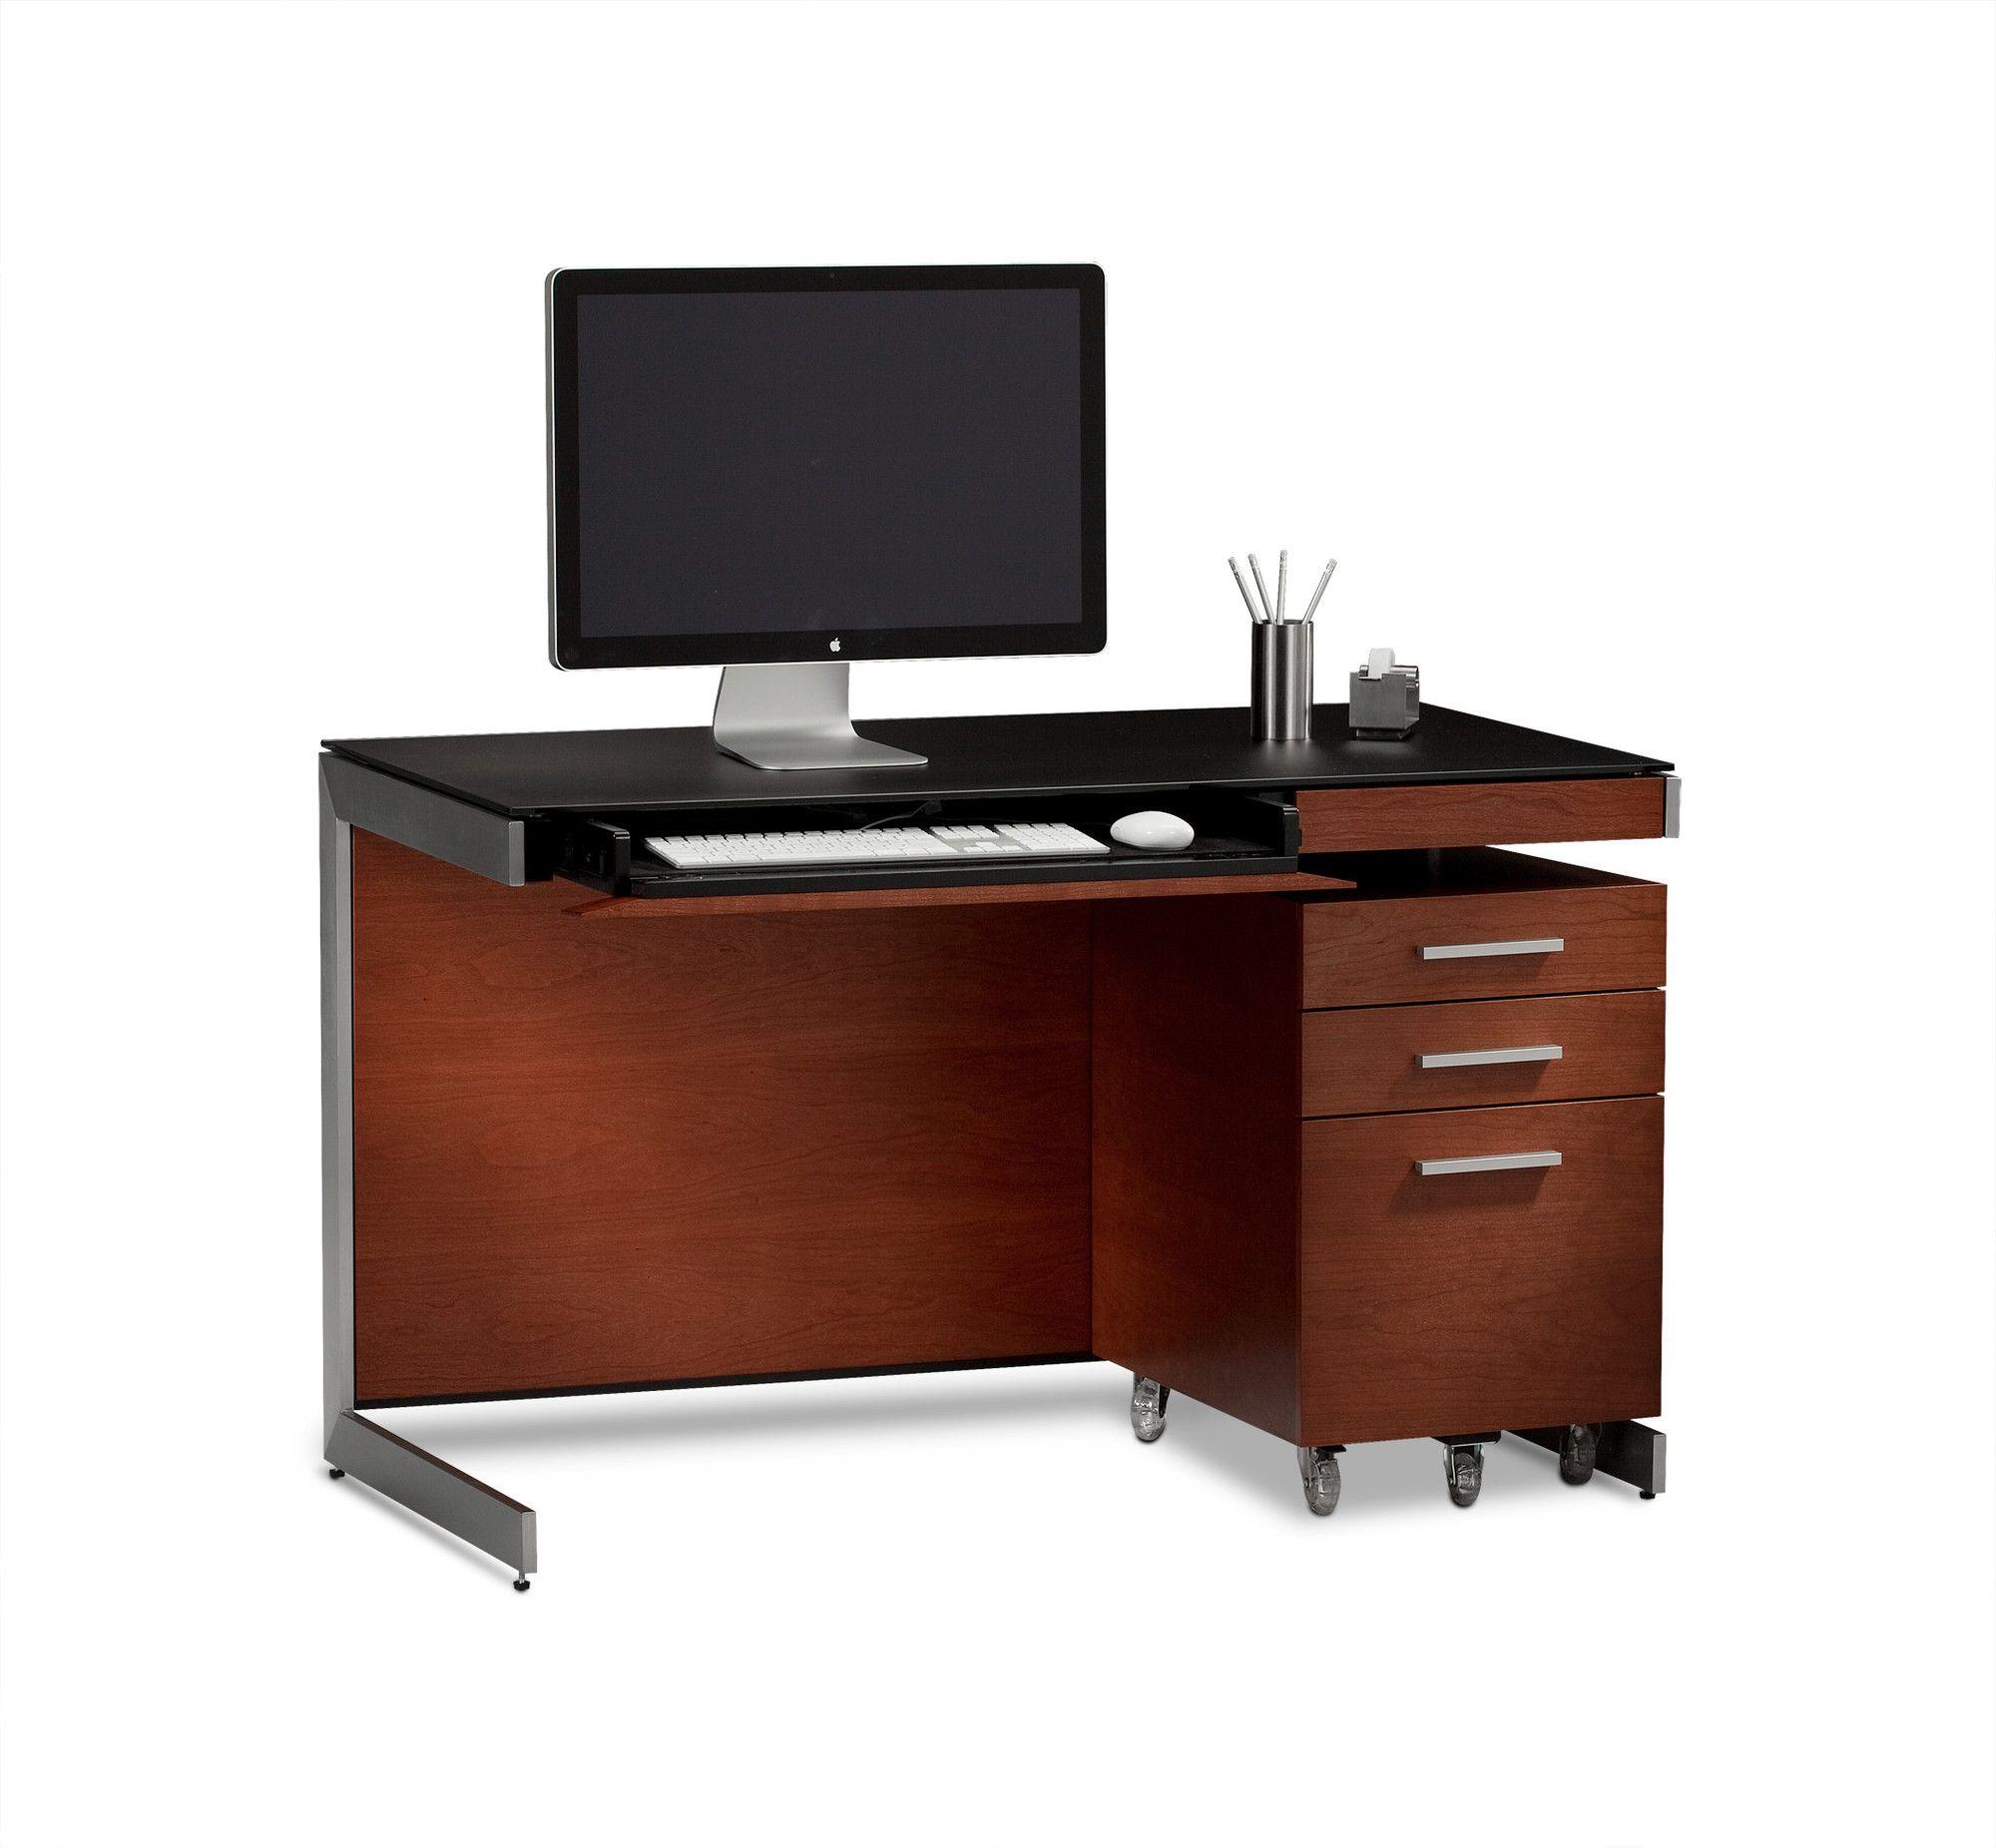 Bdi Usa 29 Sequel Compact Computer Desk With File Cabinet